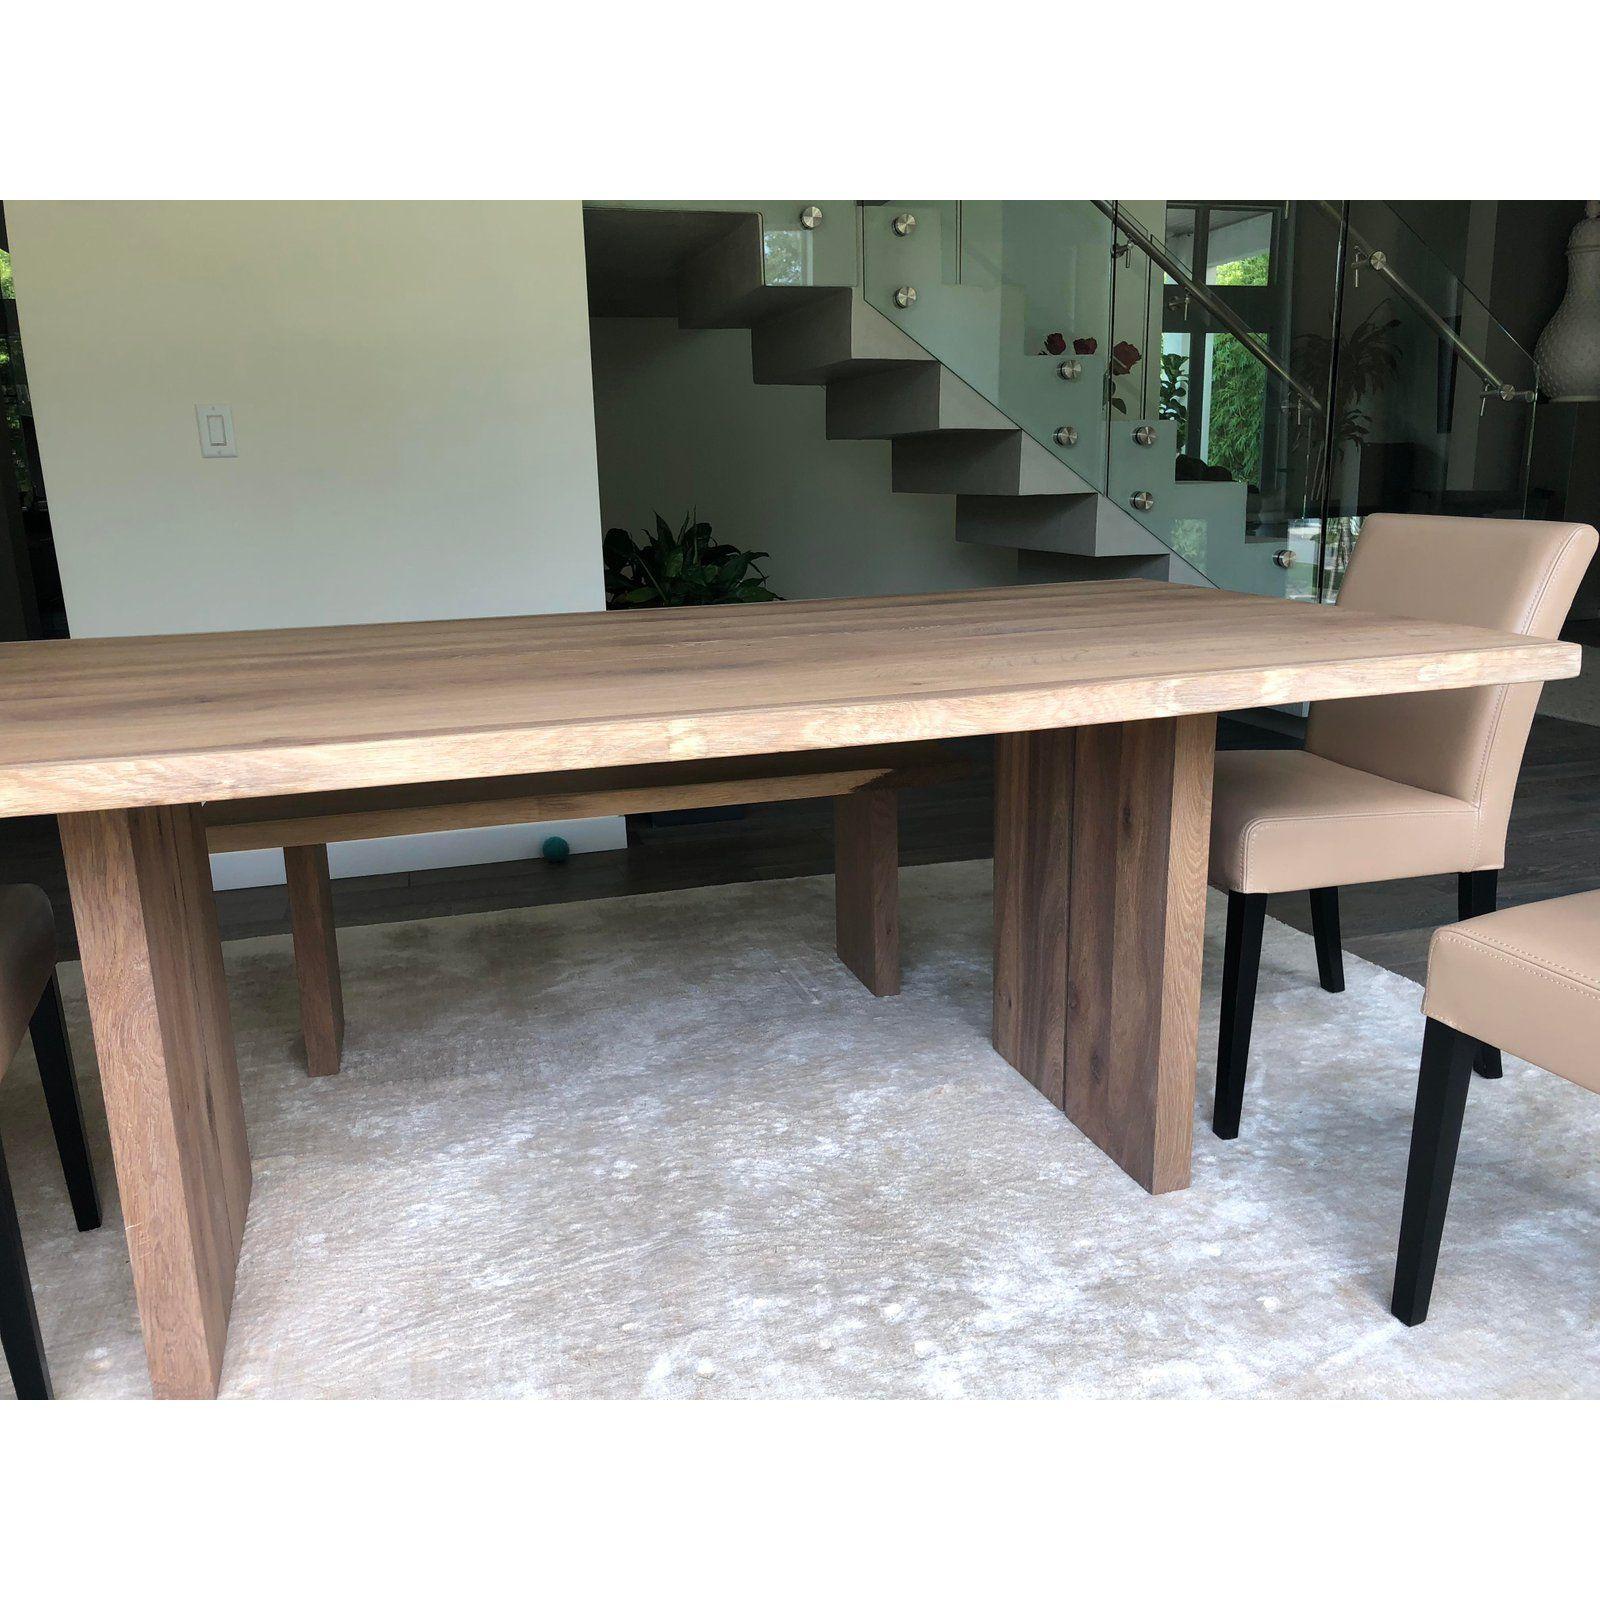 Crate Barrel European White Oak Dining Table With Matching Bench Set Oak Dining Sets White Oak Dining Table Oak Dining Table #oak #living #room #tables